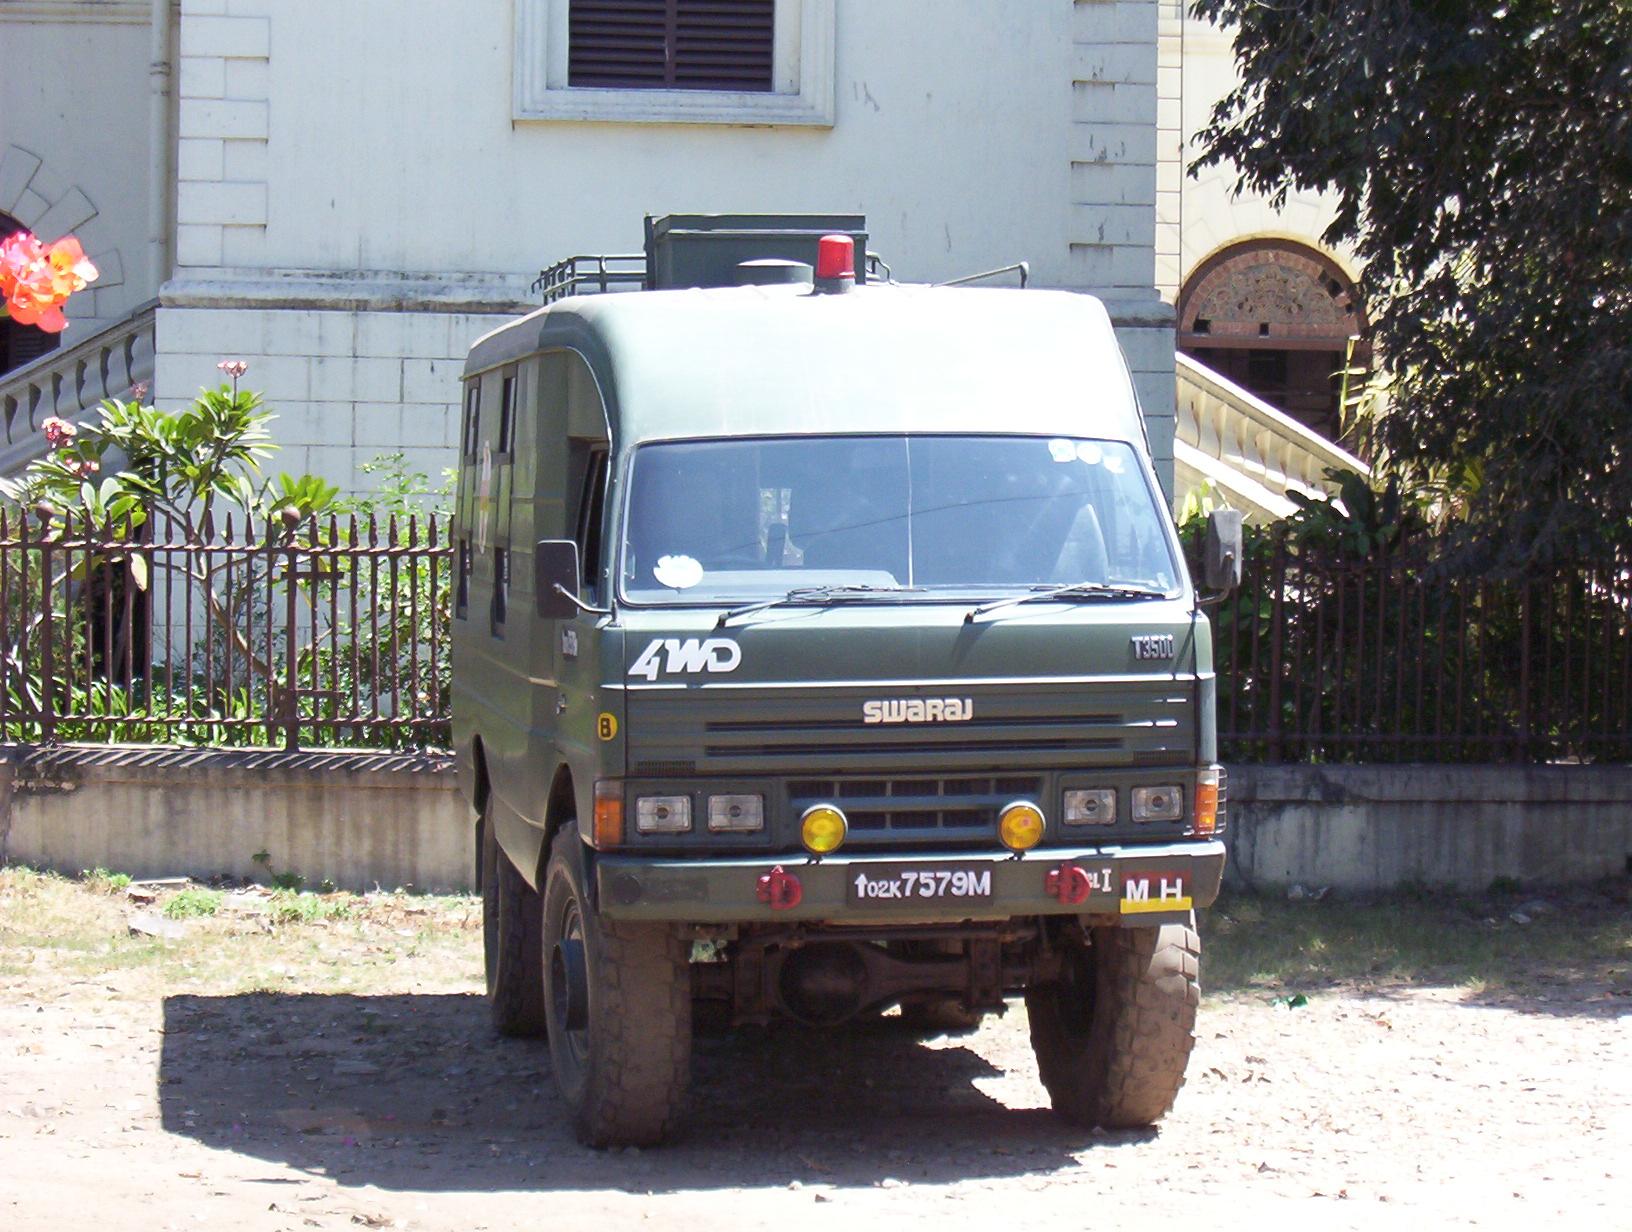 hight resolution of file india army swarajt3500 2007 front jpg wikimedia commons wiring distributor 1990 mazda 323 mazda t